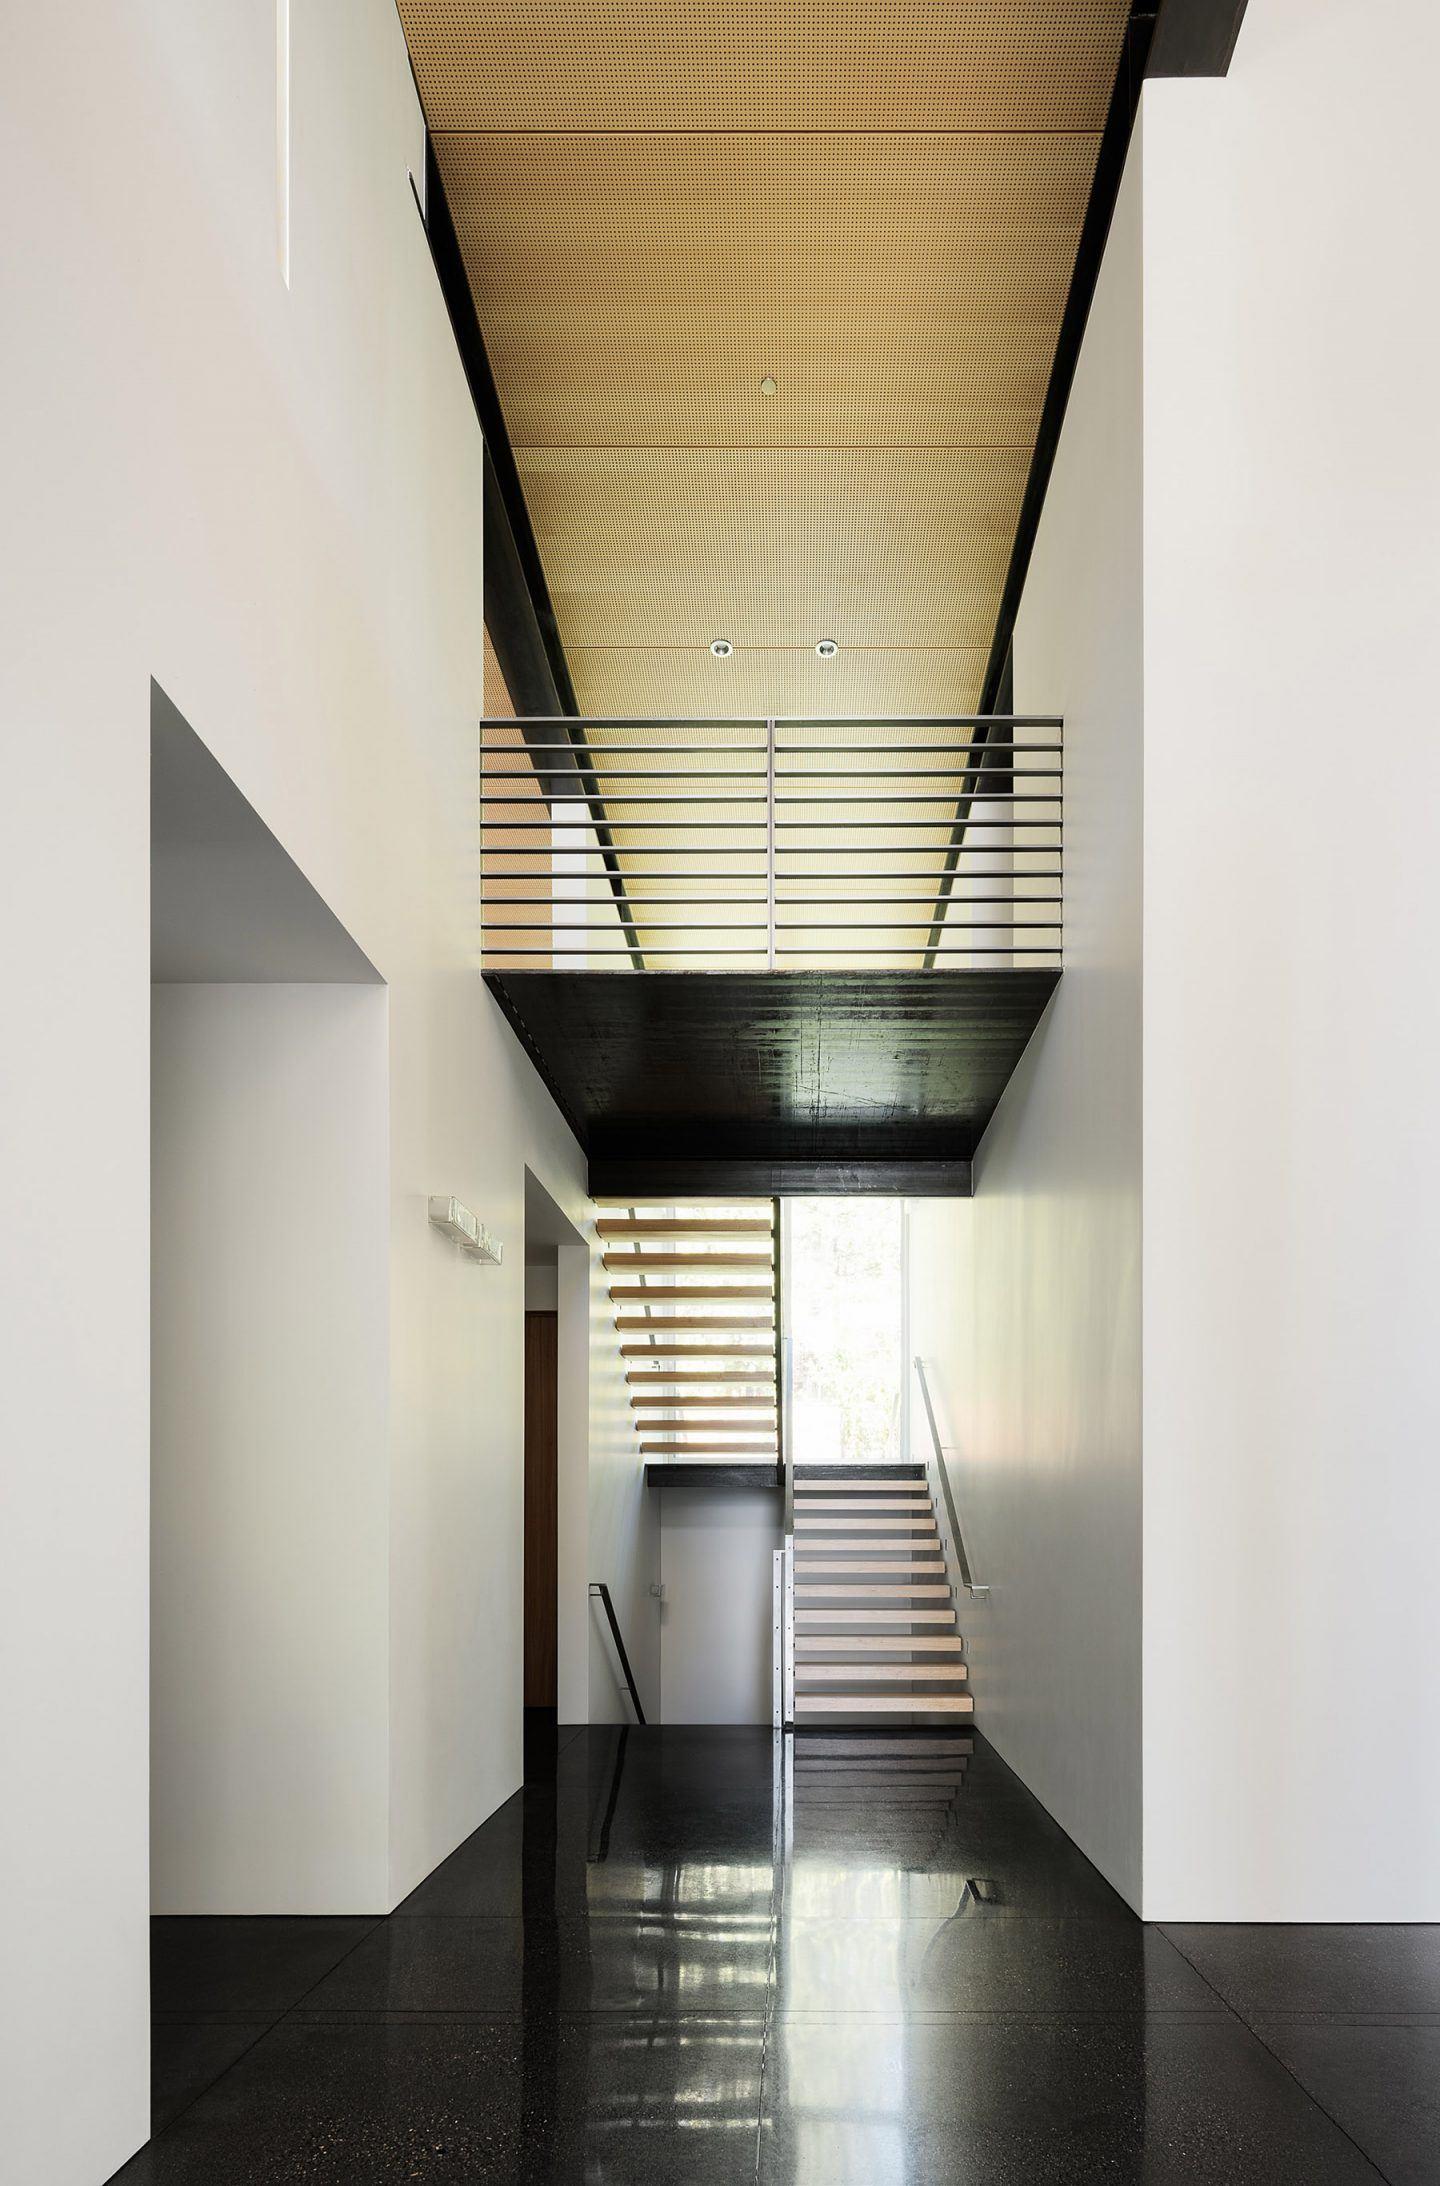 IGNANT-Architecture-Faulkner-Architects-Burnt-Cedar-02